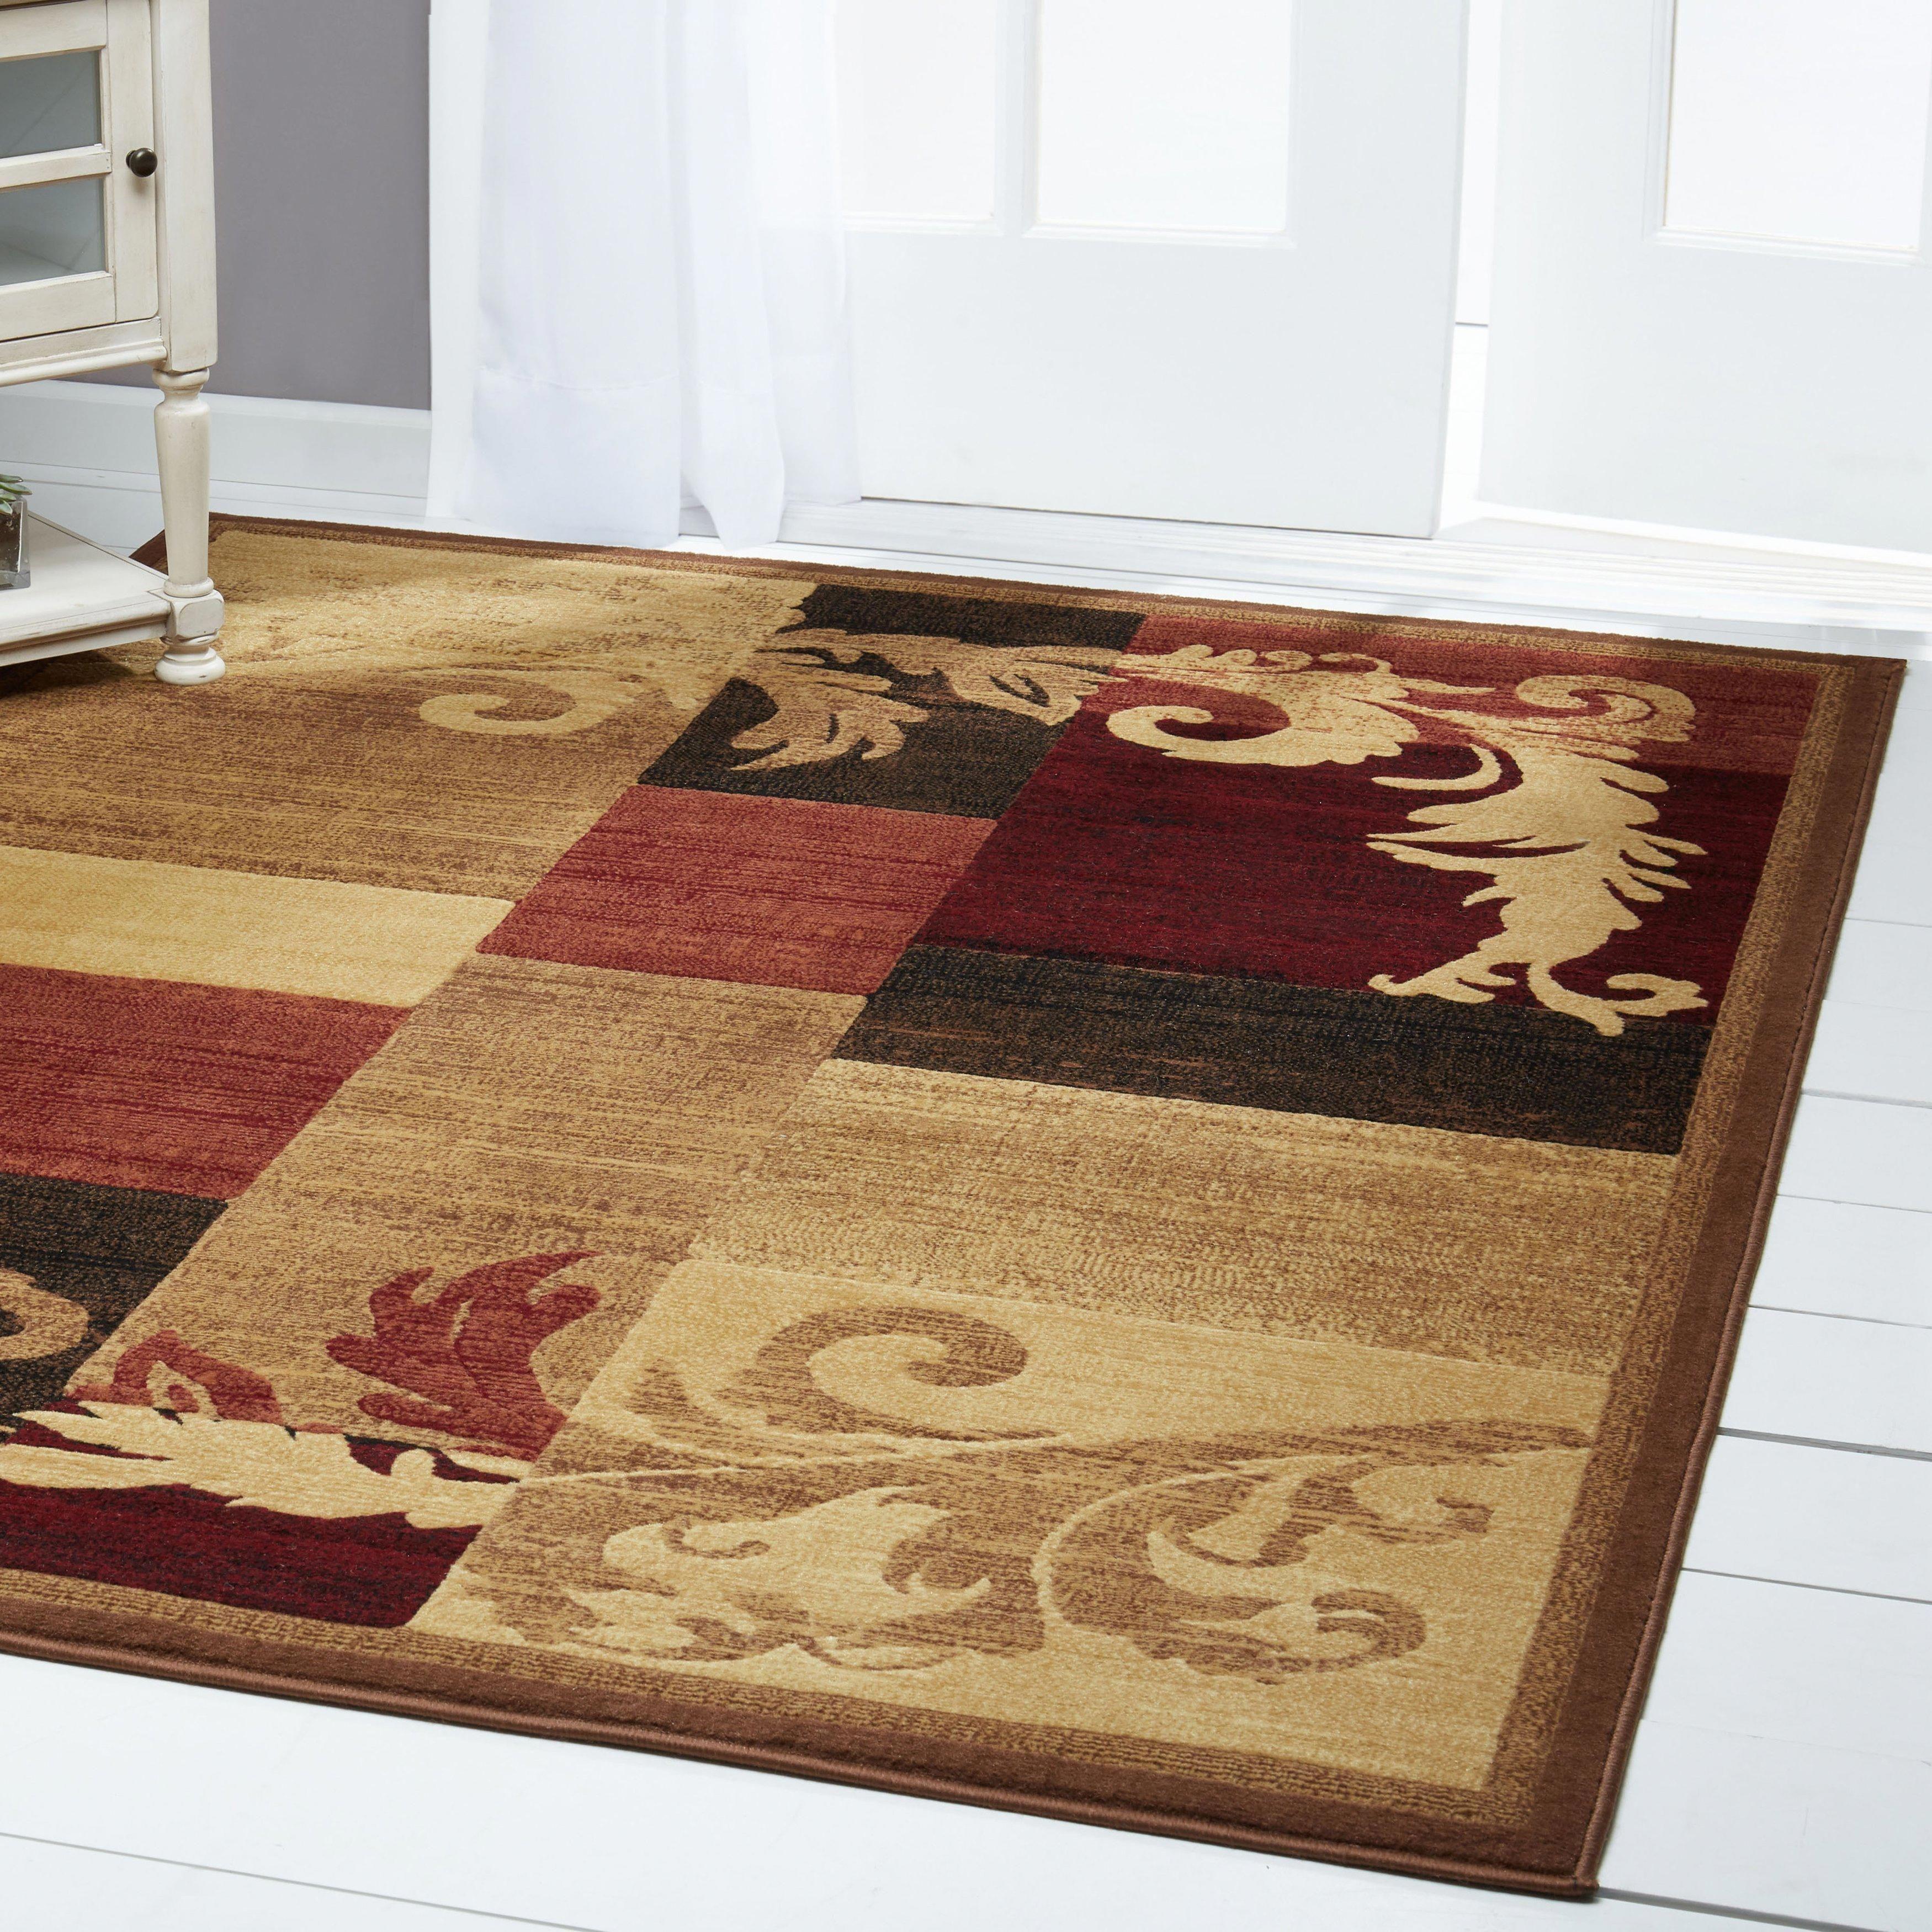 Carpet Runners For Hallways Ikea Carpetrunners300cmlong Post 6263894929 Modern Rug Design Geometric Carpet Area Rug Sizes